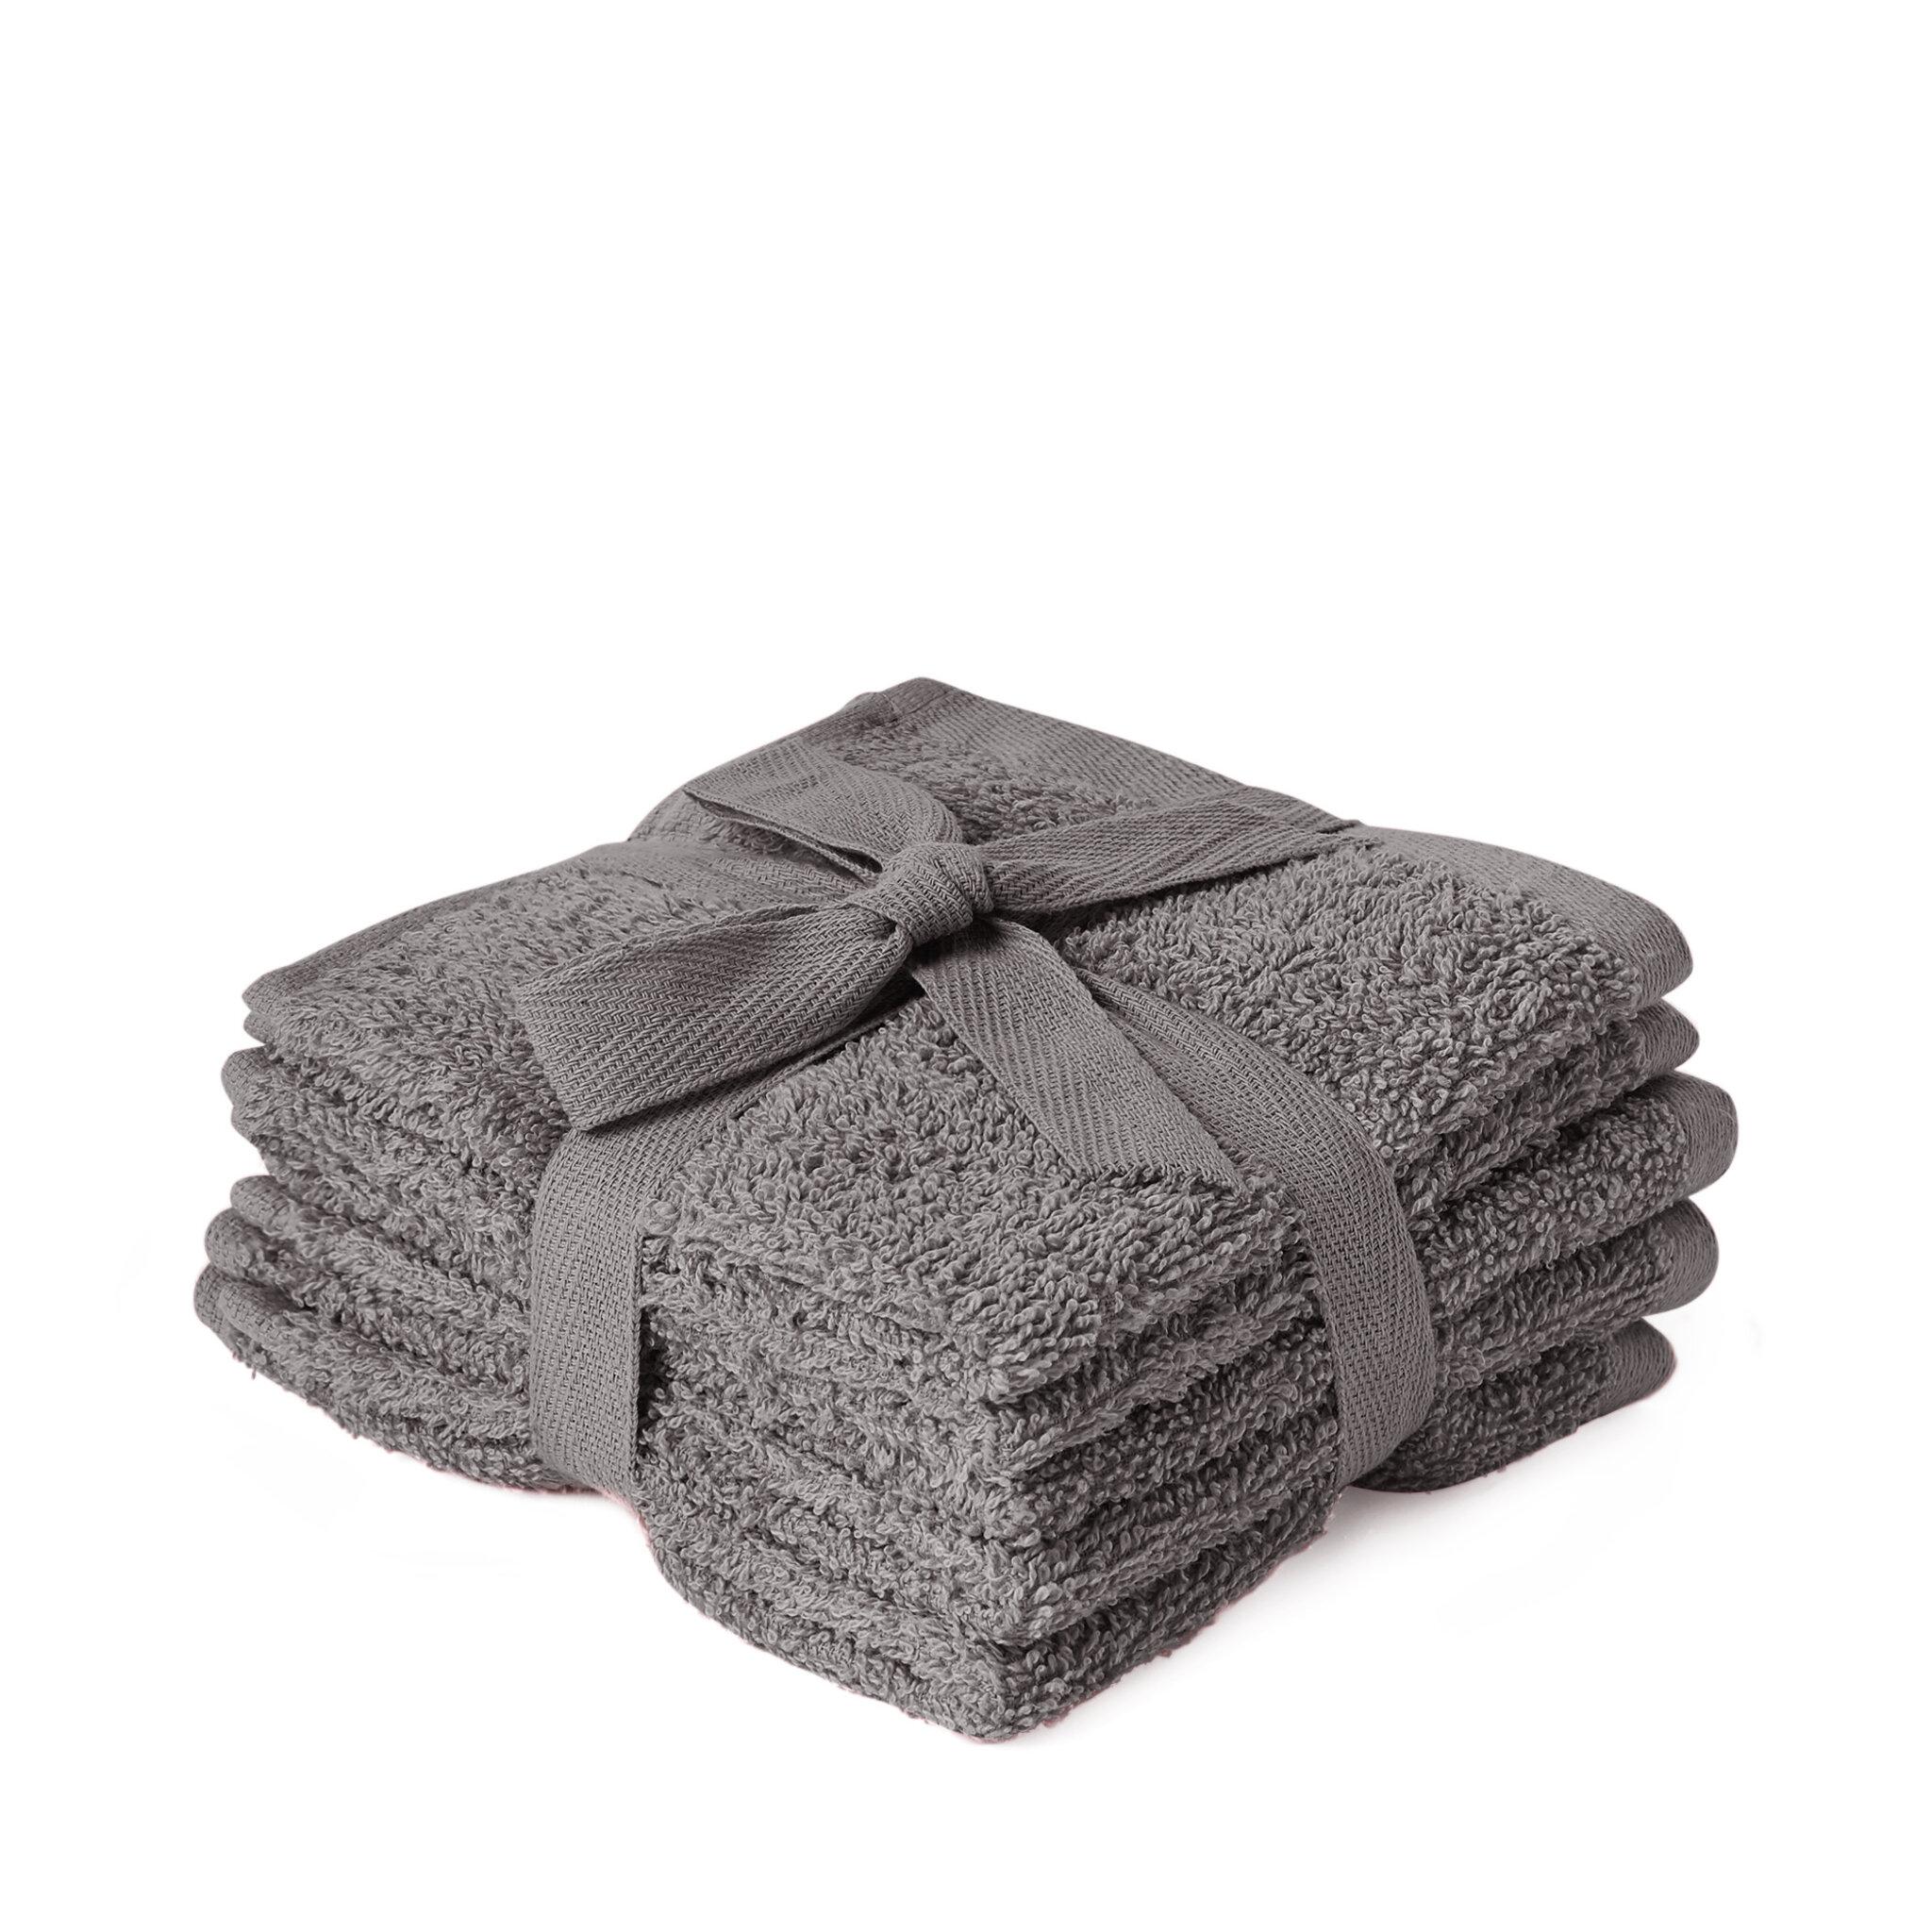 Handduk Moa, 30x30 cm, 5-pack